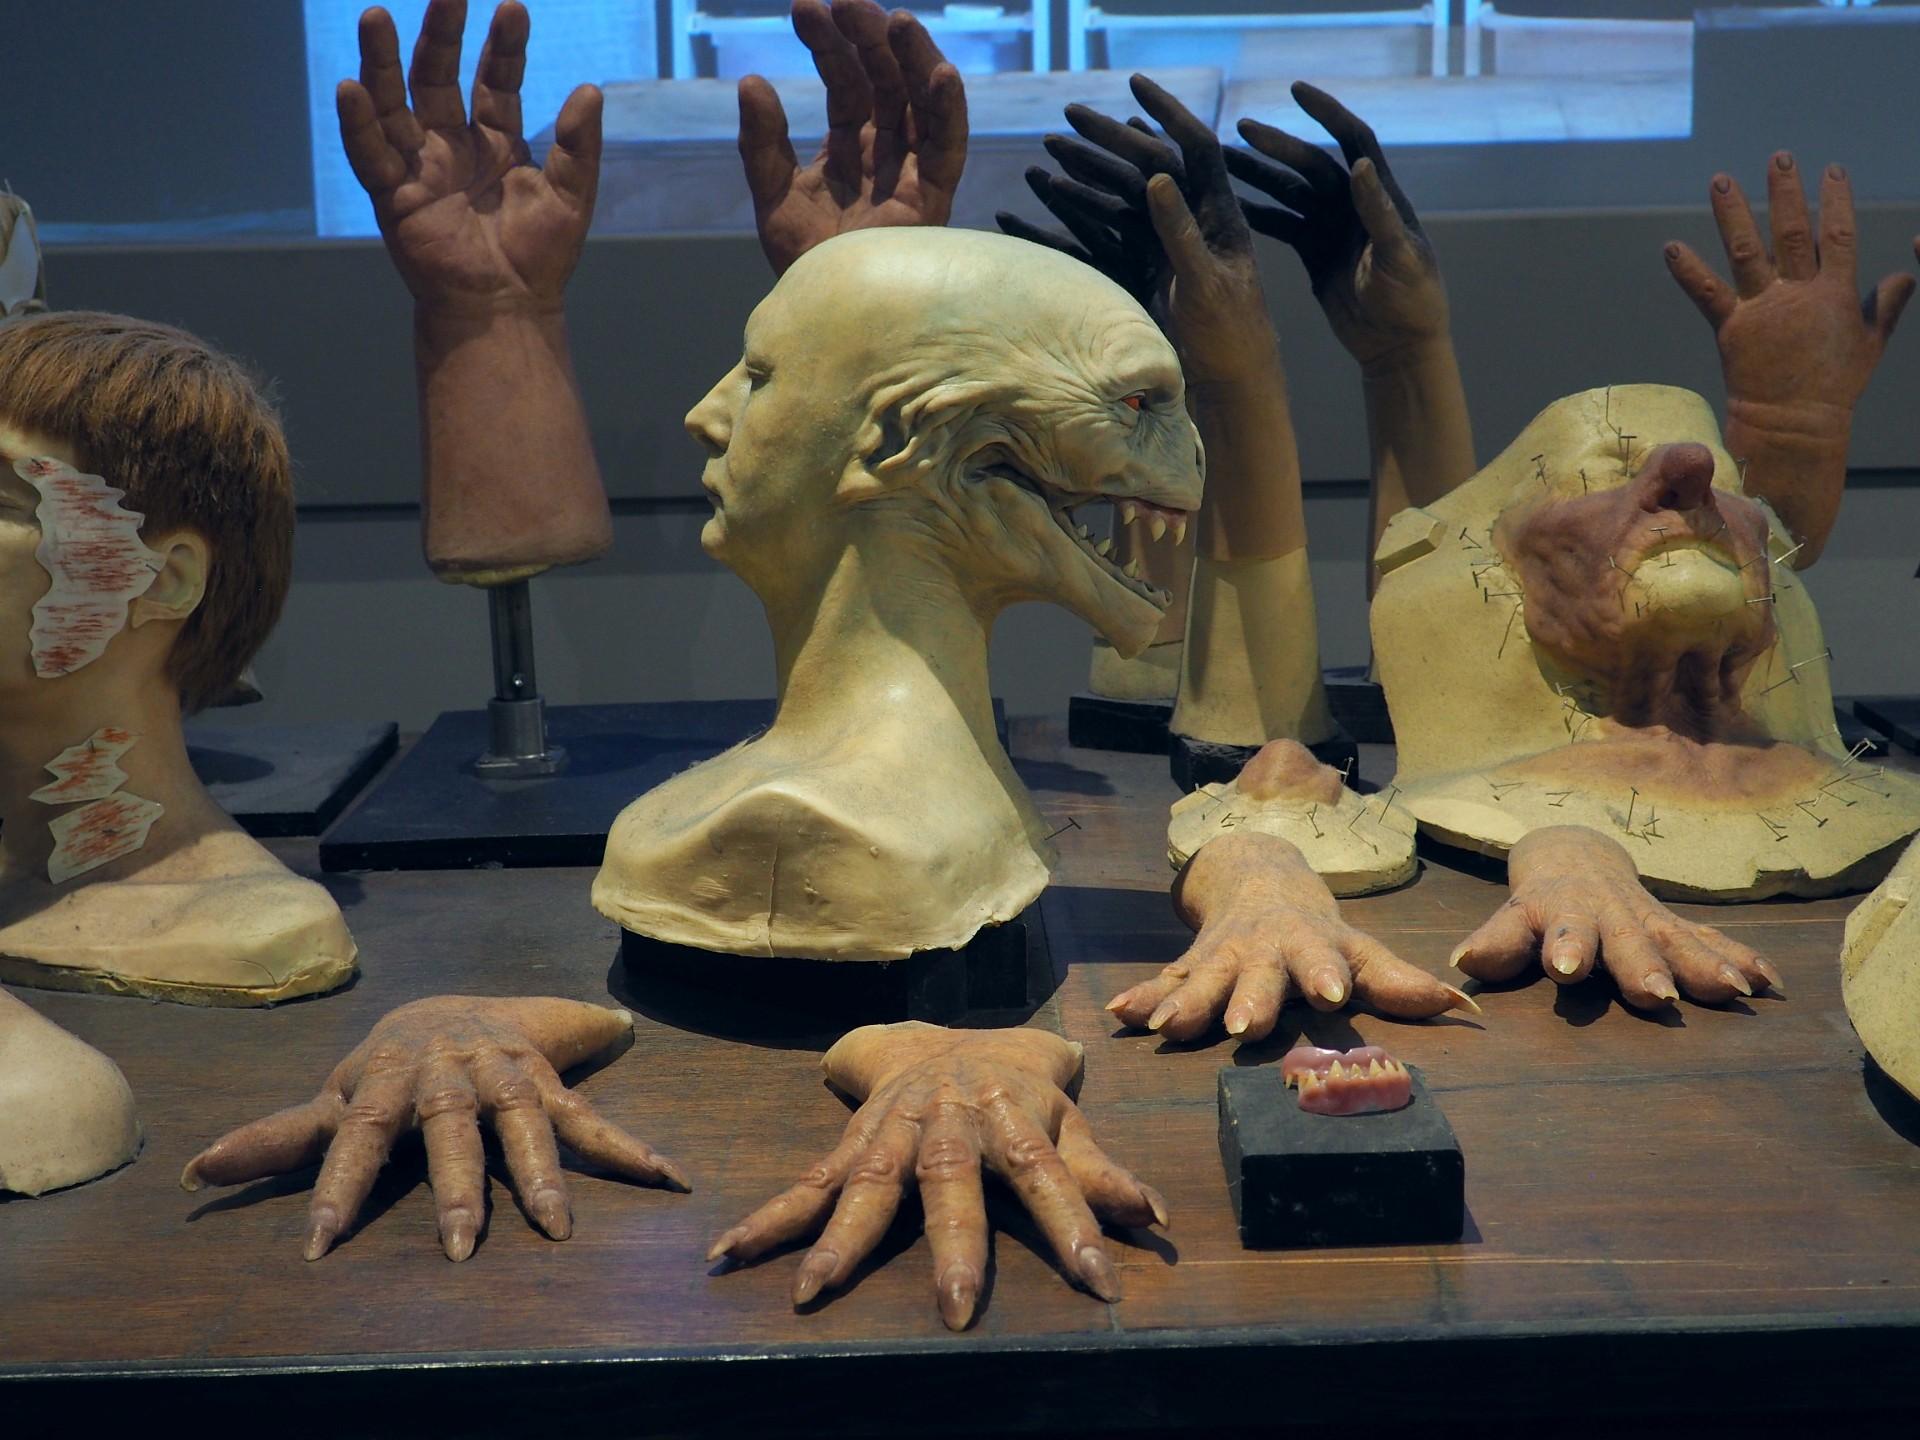 Harry Potter Studio Tour - Voldemort Quirrell Mask